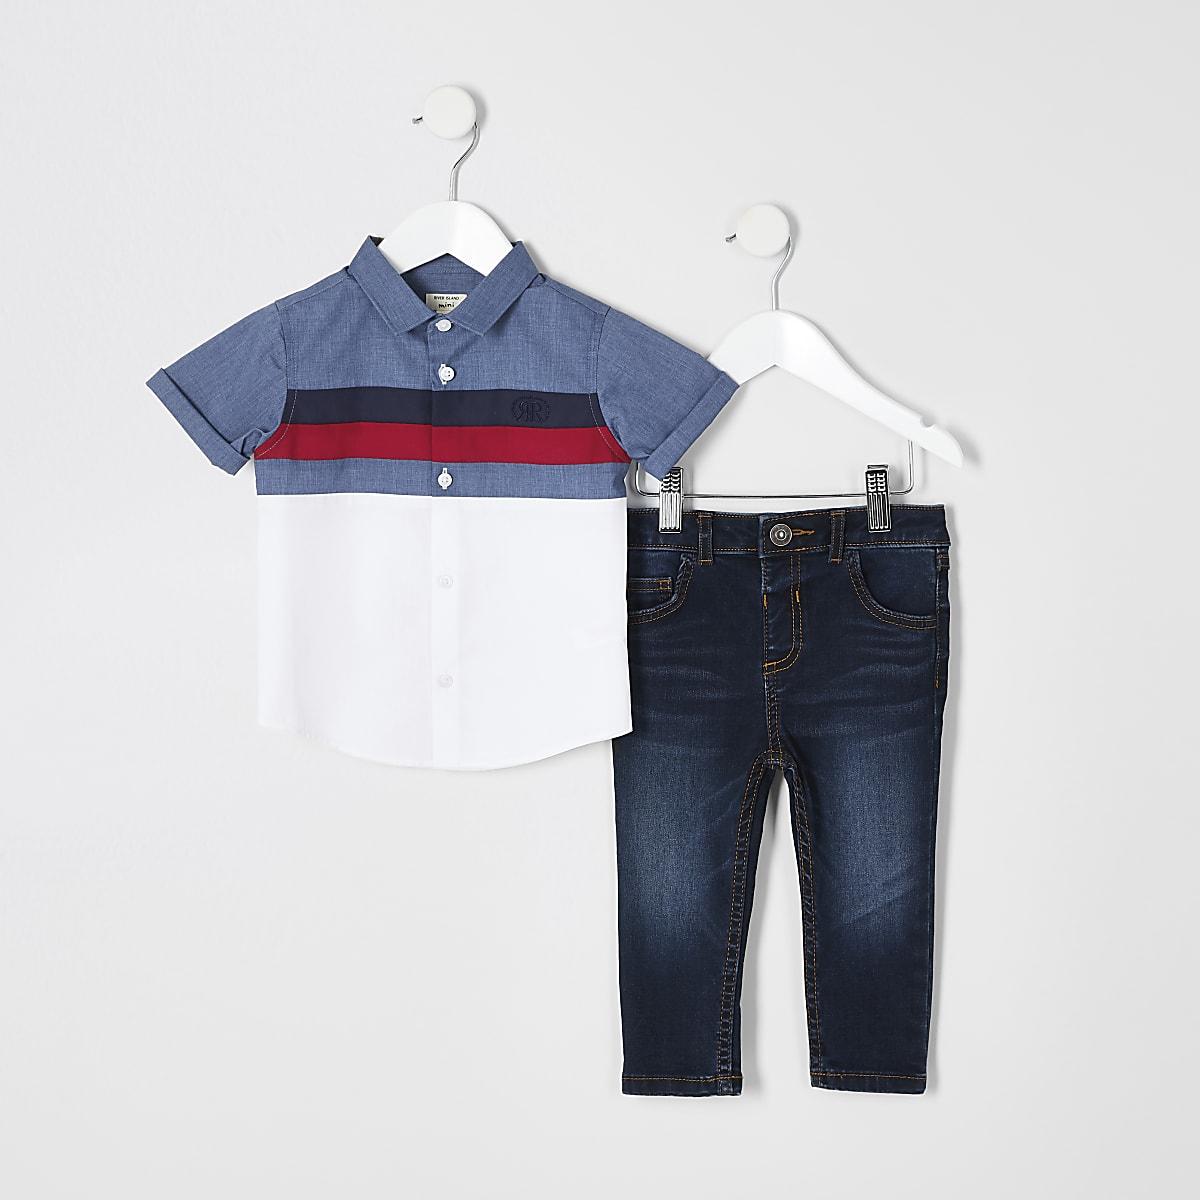 Mini boys navy block shirt outfit